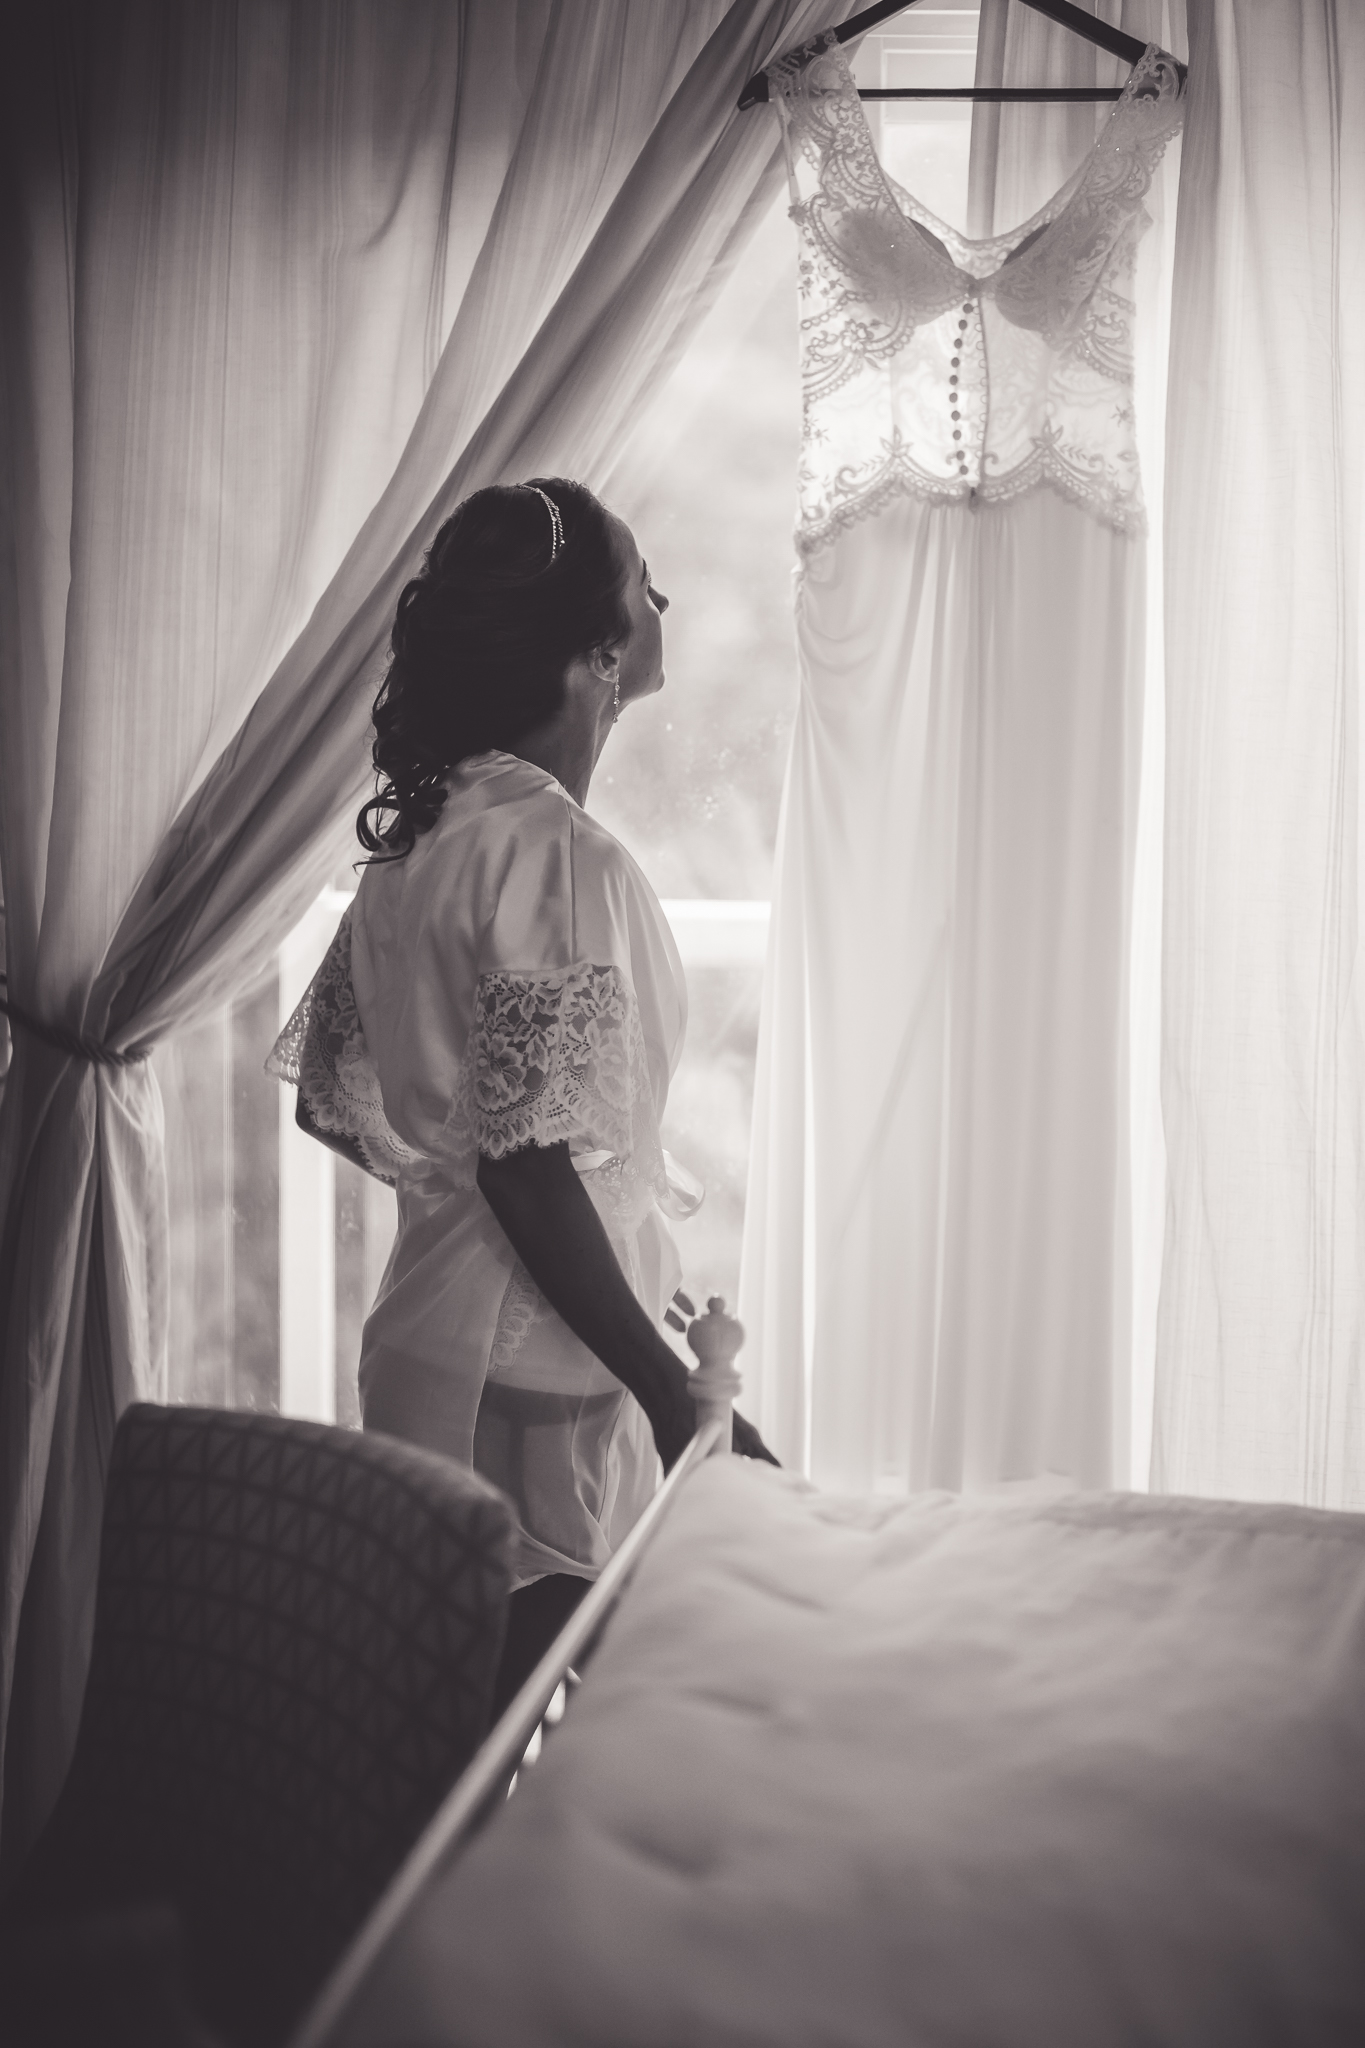 Amy D Photography- Barrie Wedding Photography- Bride Getting Ready- Muskoka Wedding Photography- Best Wedding Photographers (130 of 130).jpg